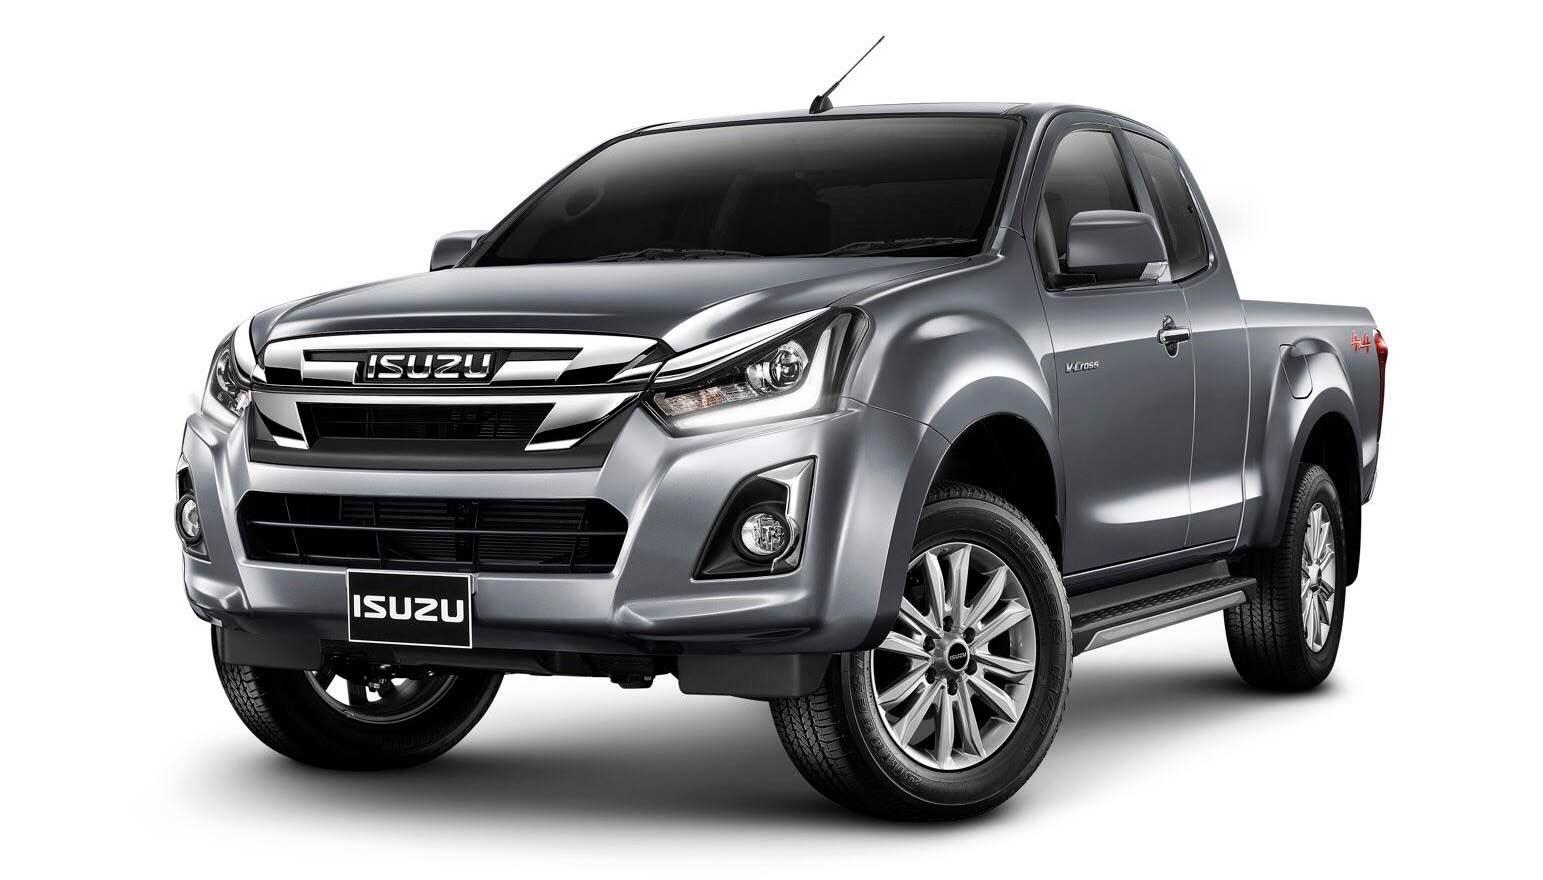 Isuzu-D-Max-facelift-Thailand_2